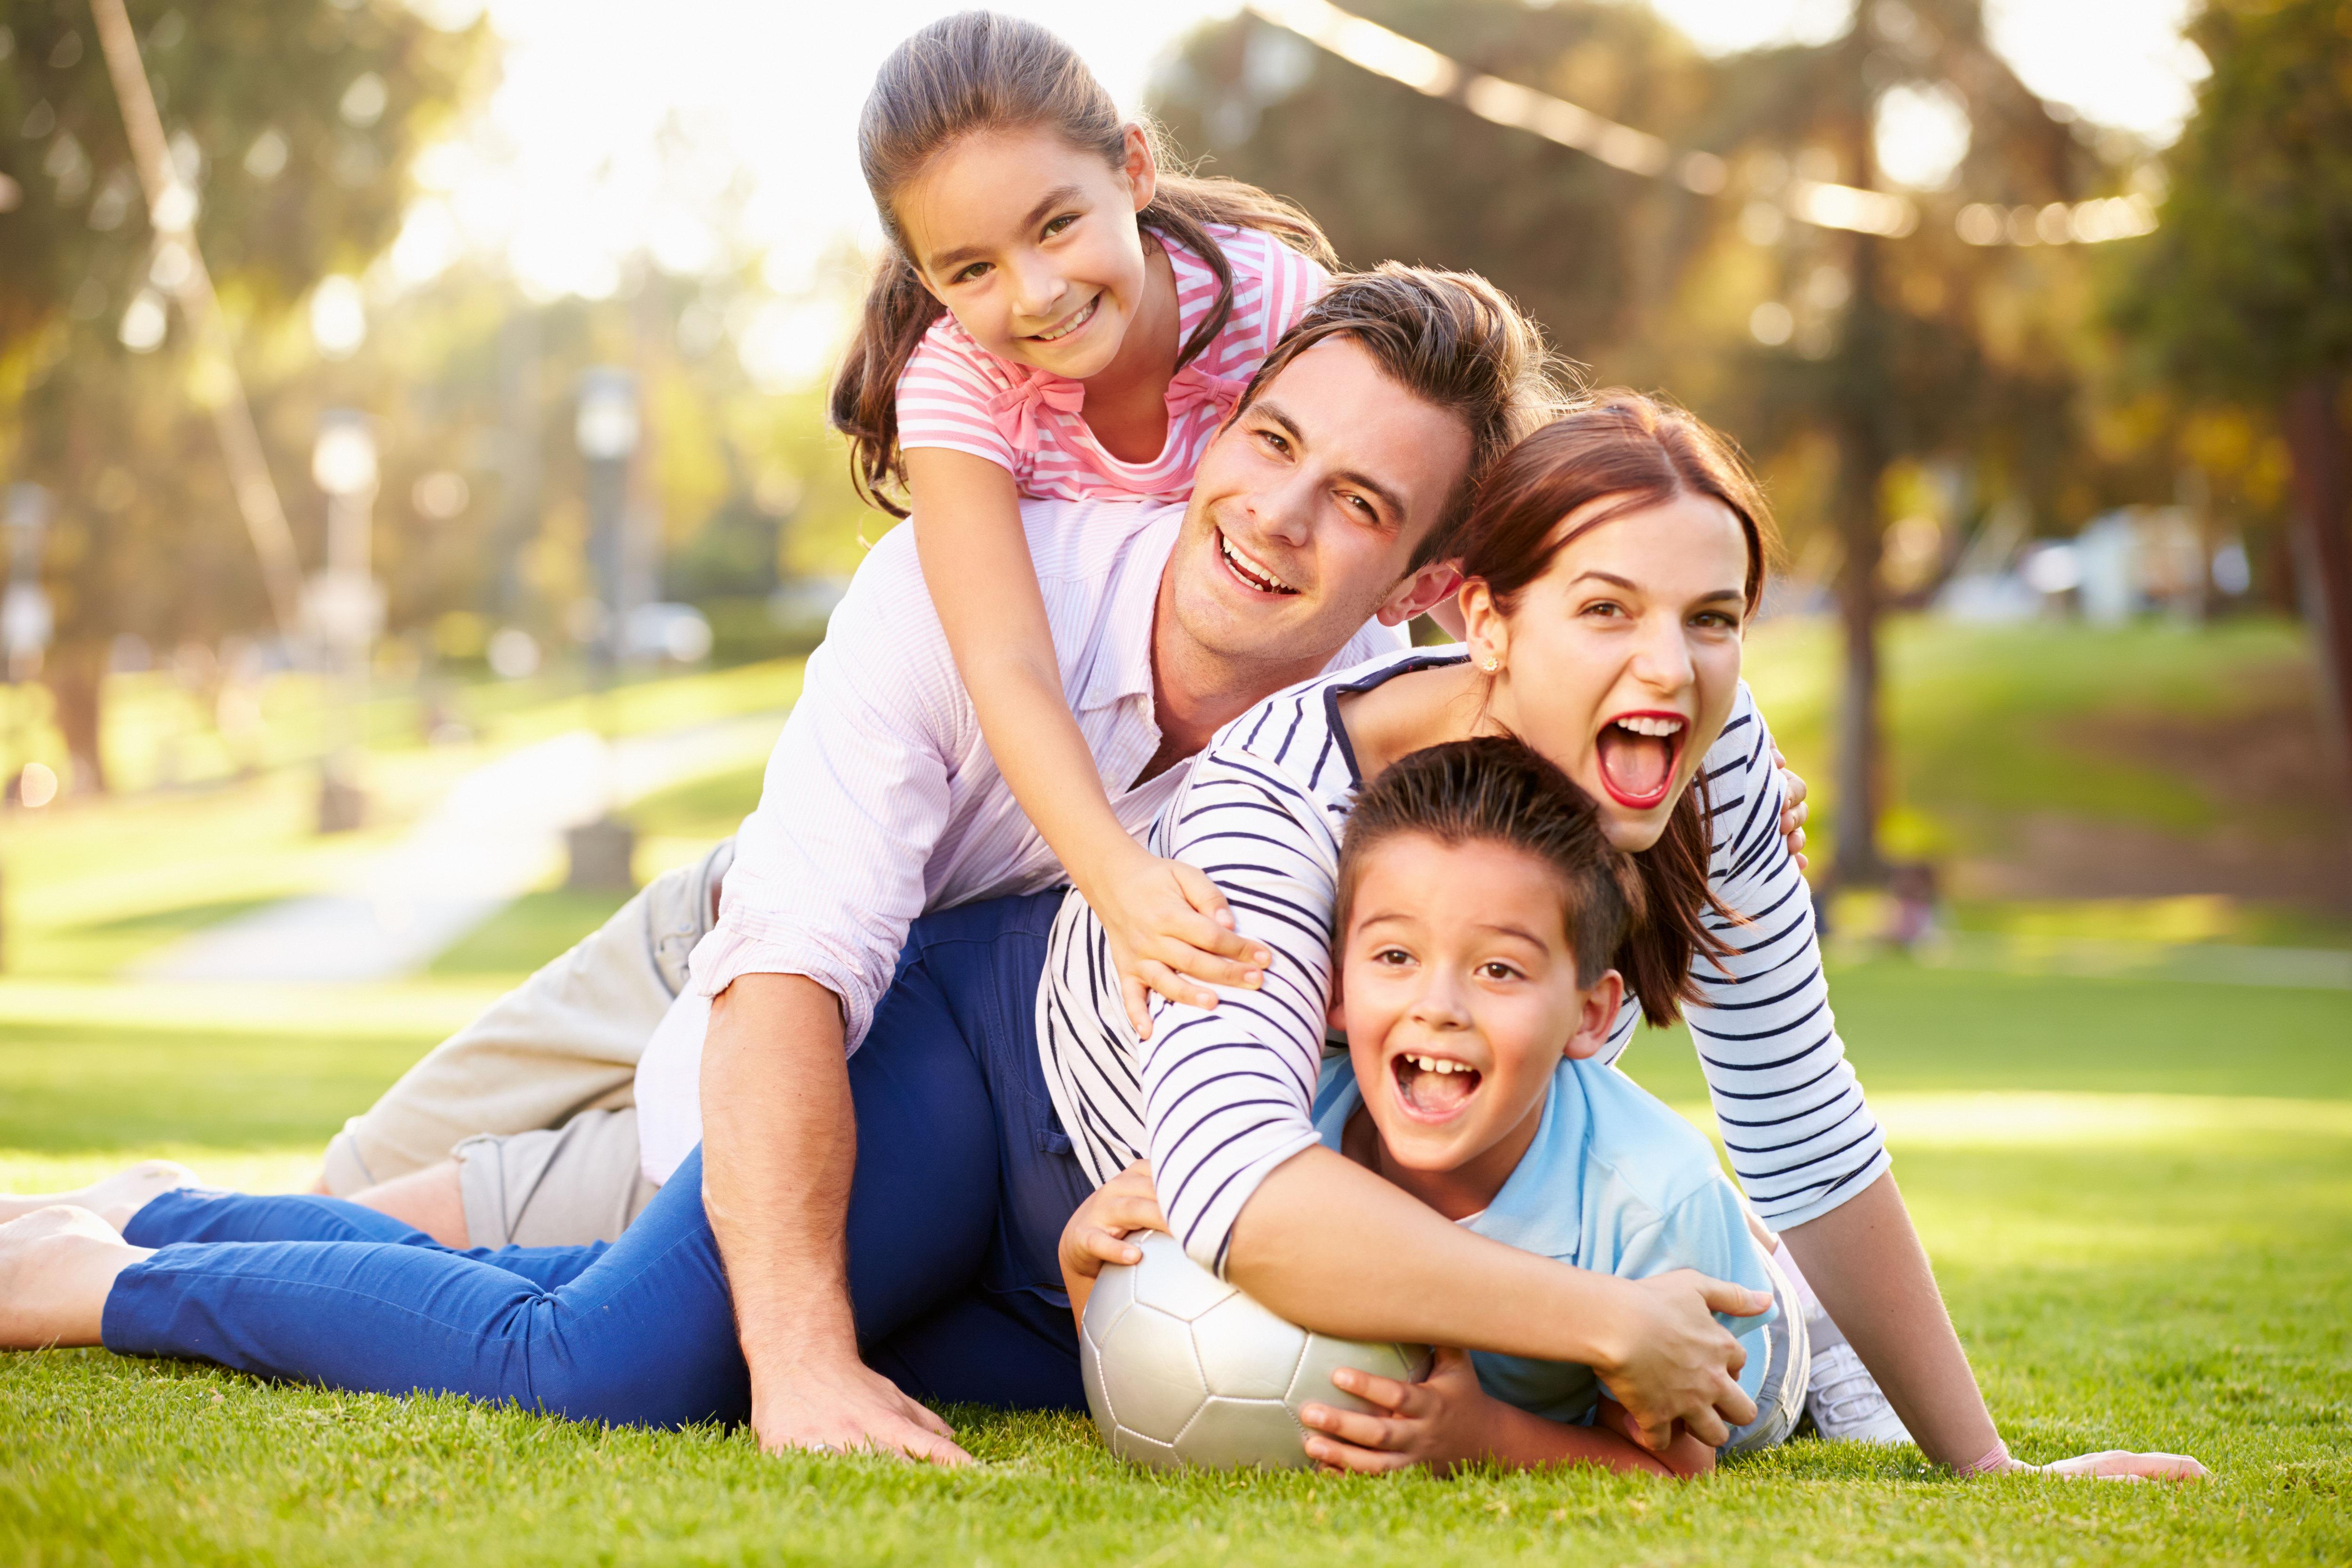 Картинки про счастливую семью